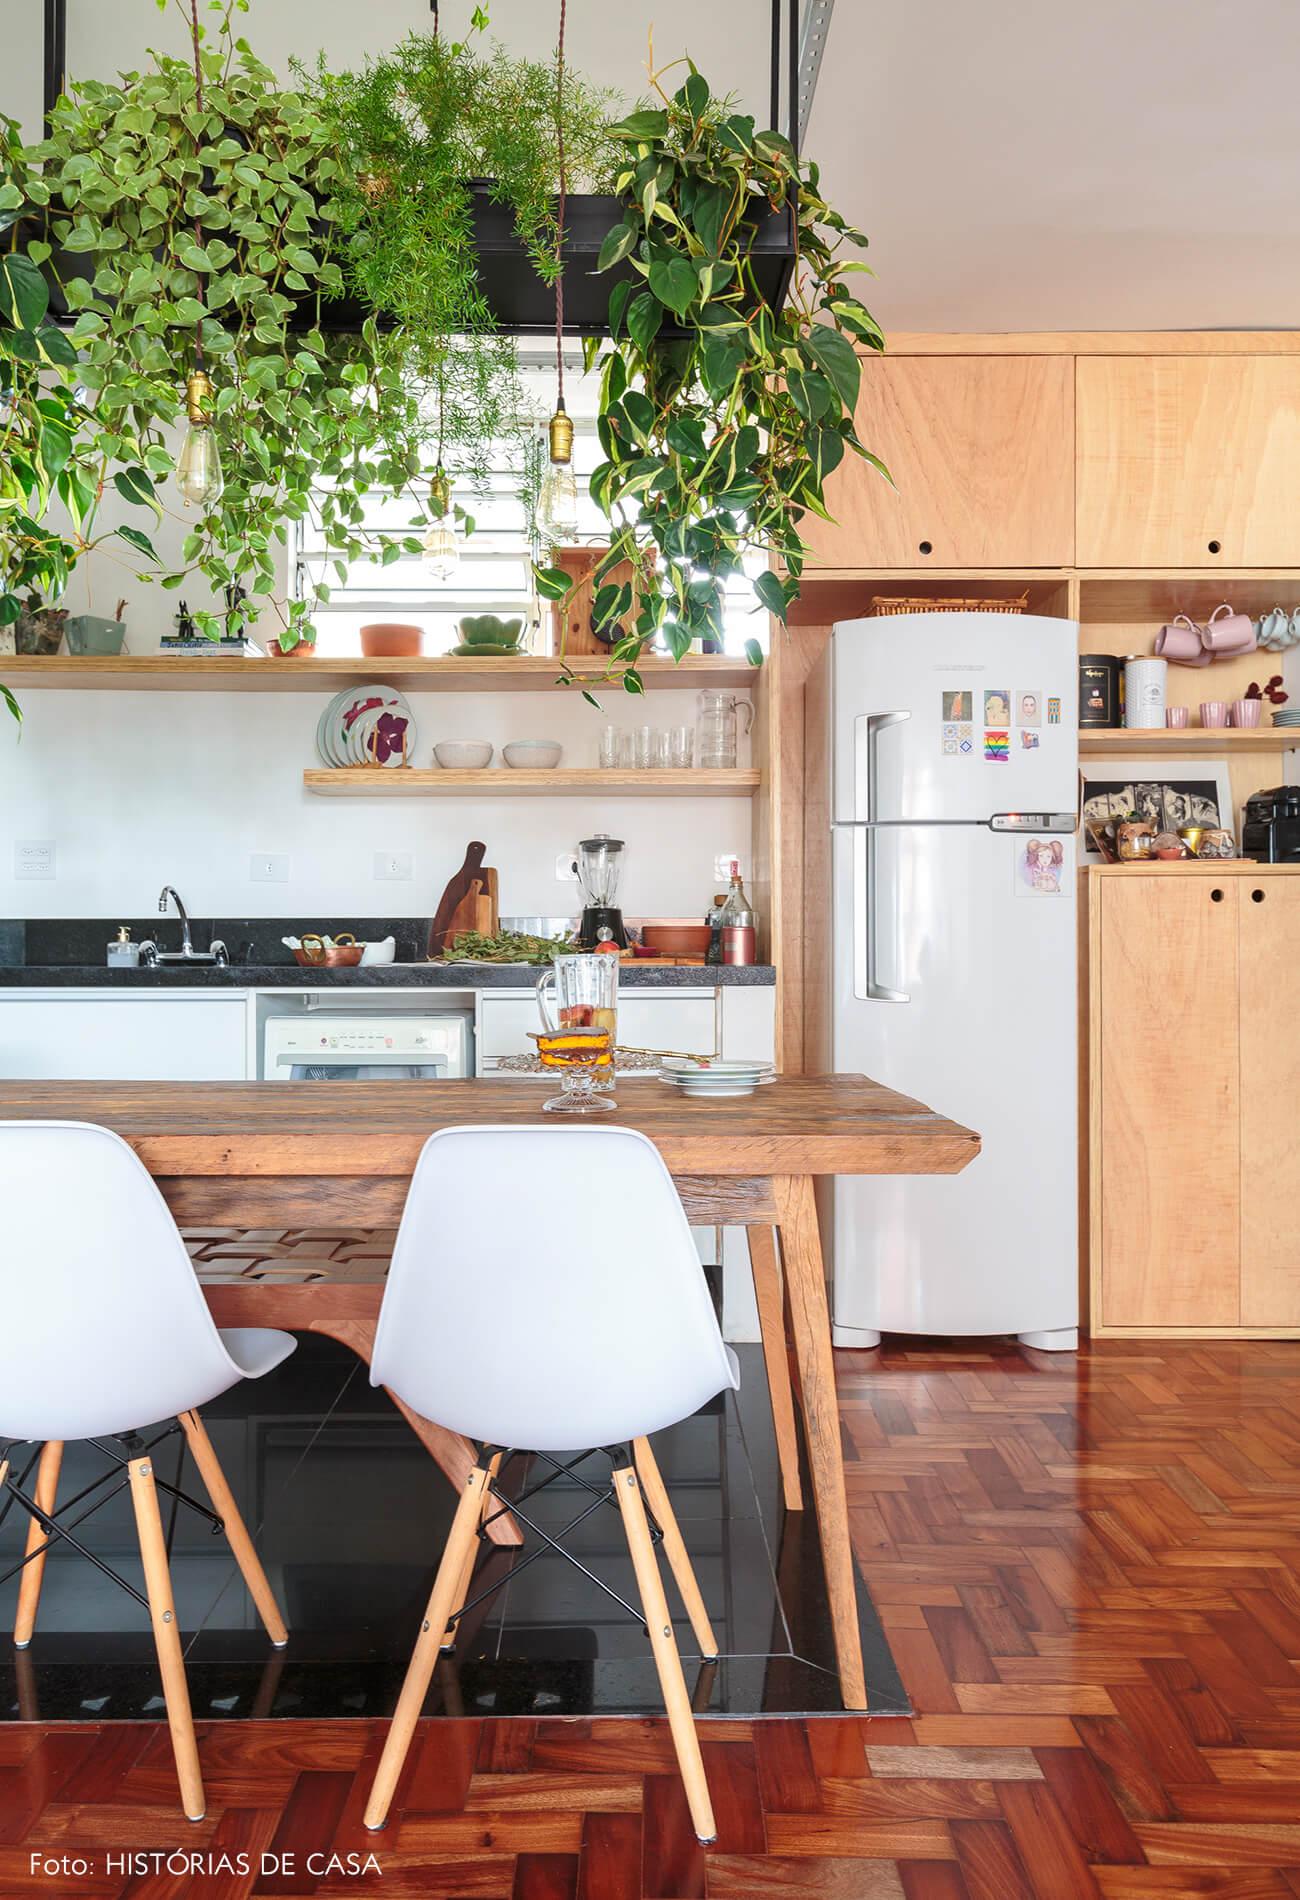 cozinha-piso-taco-madeira-cadeira-eames-branca-plantas-suspensas-jiboia-mesa-armario-banco-madeira